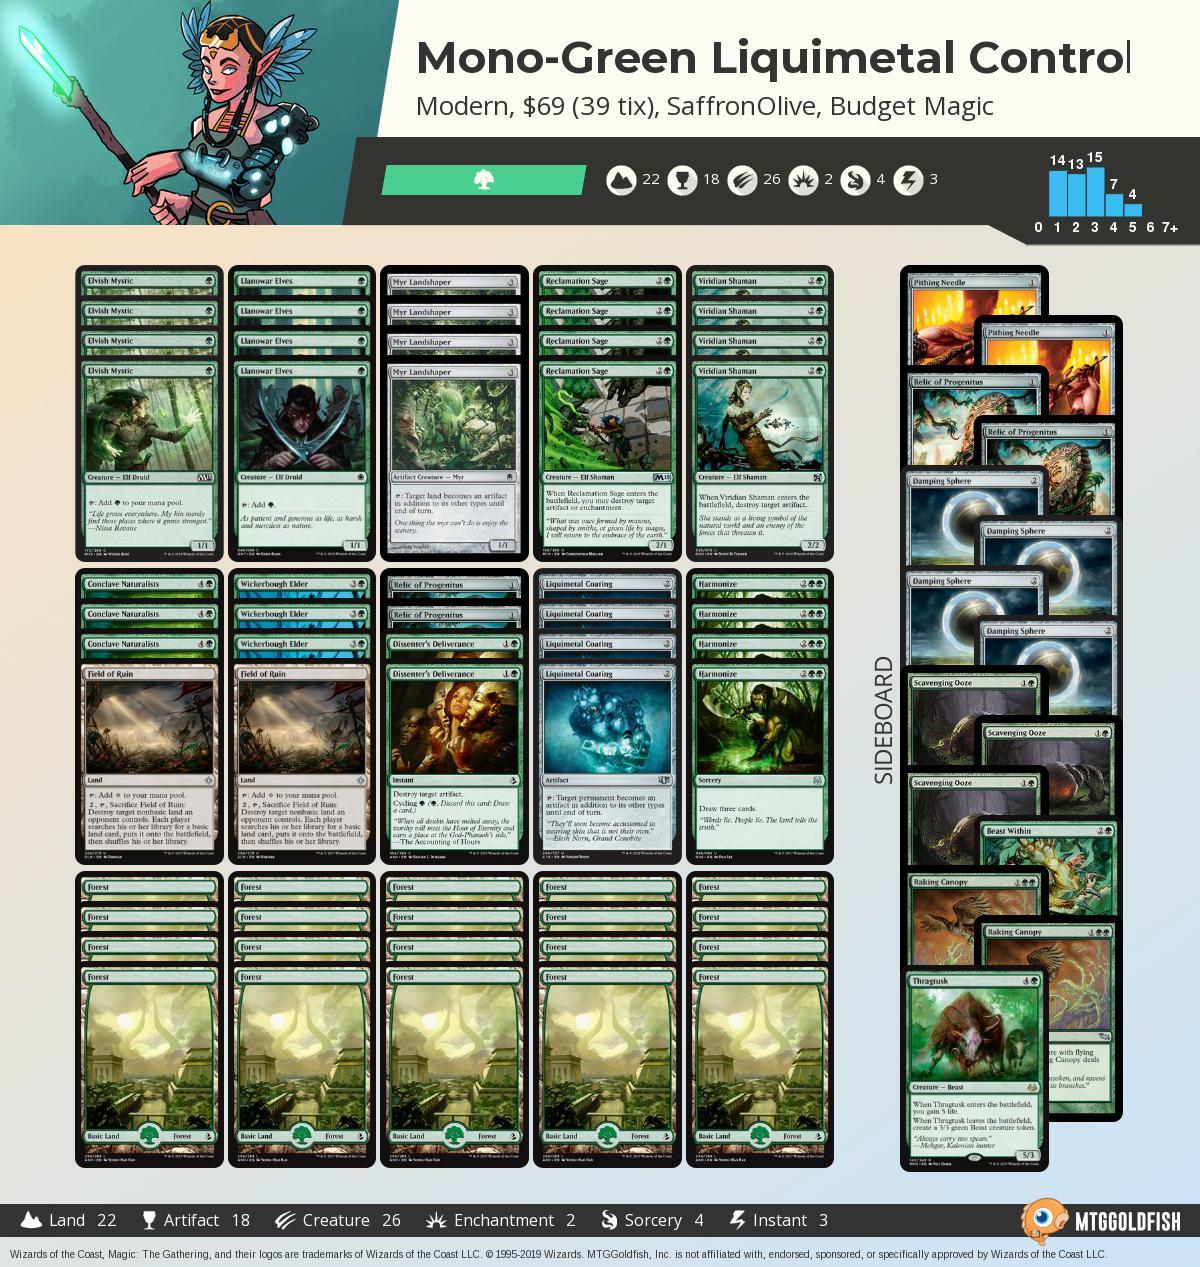 Mono green%2bliquimetal%2bcontrol 4e530254 c806 4052 bdce 813ed08566ca%2ejpg